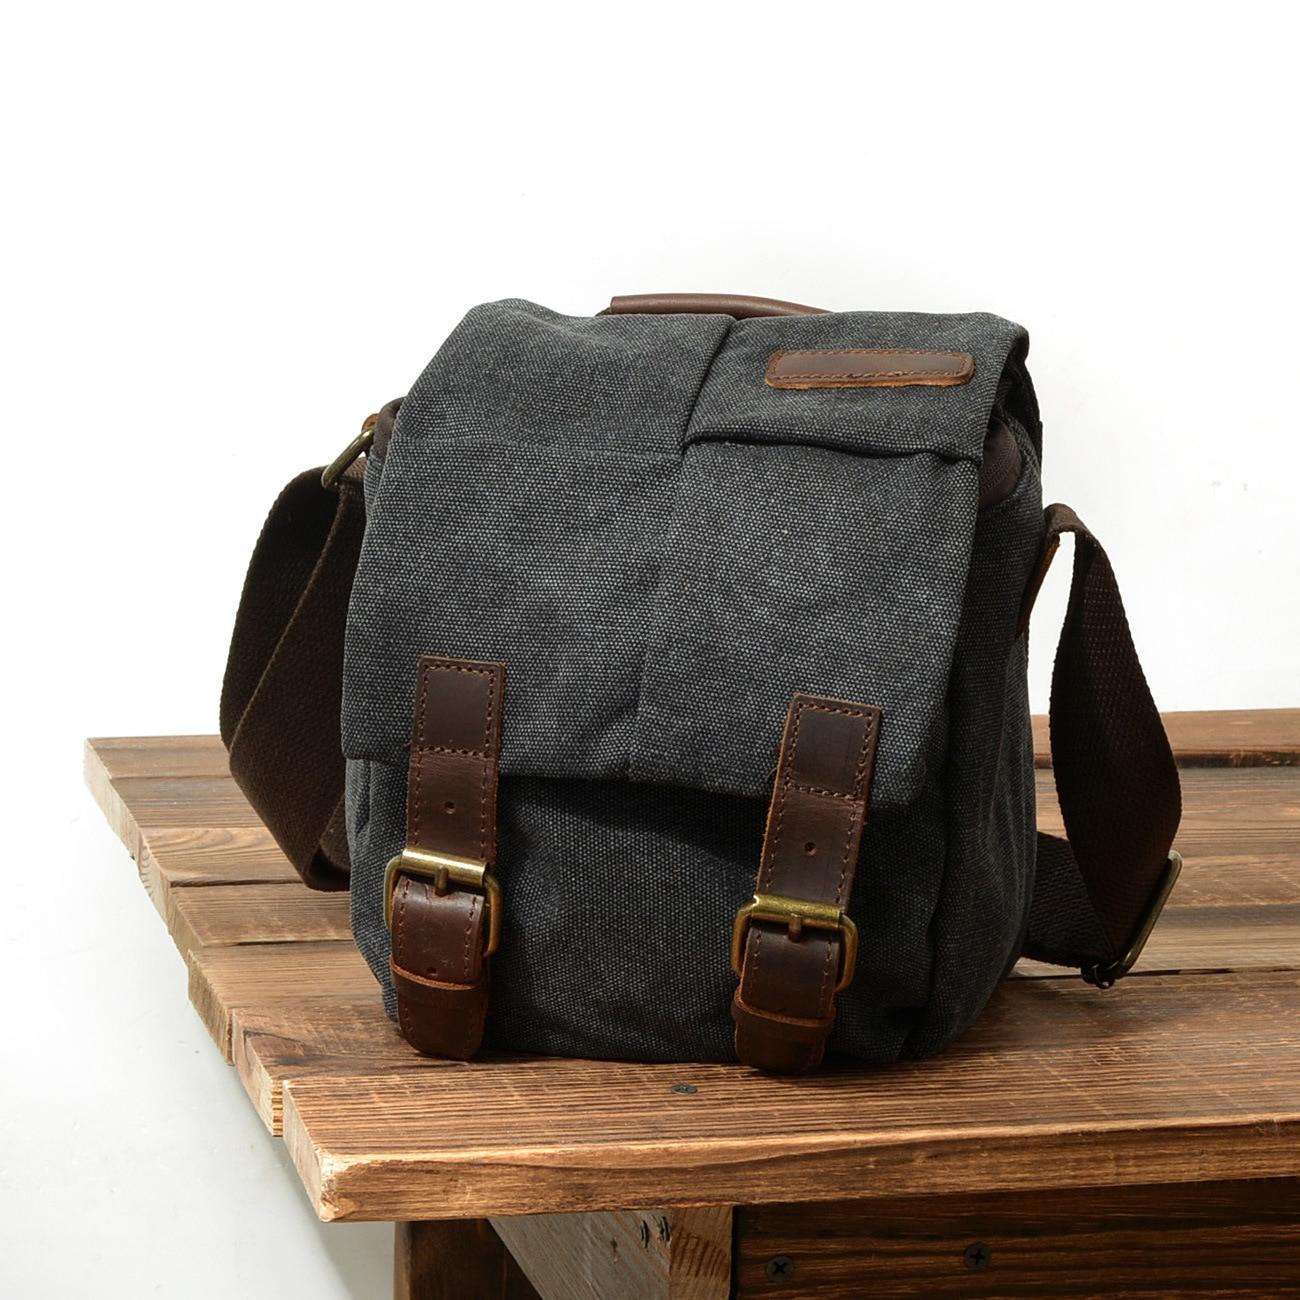 Sac en toile unisexe sac de messager épaule rétro caméra sac étanche caméra sac